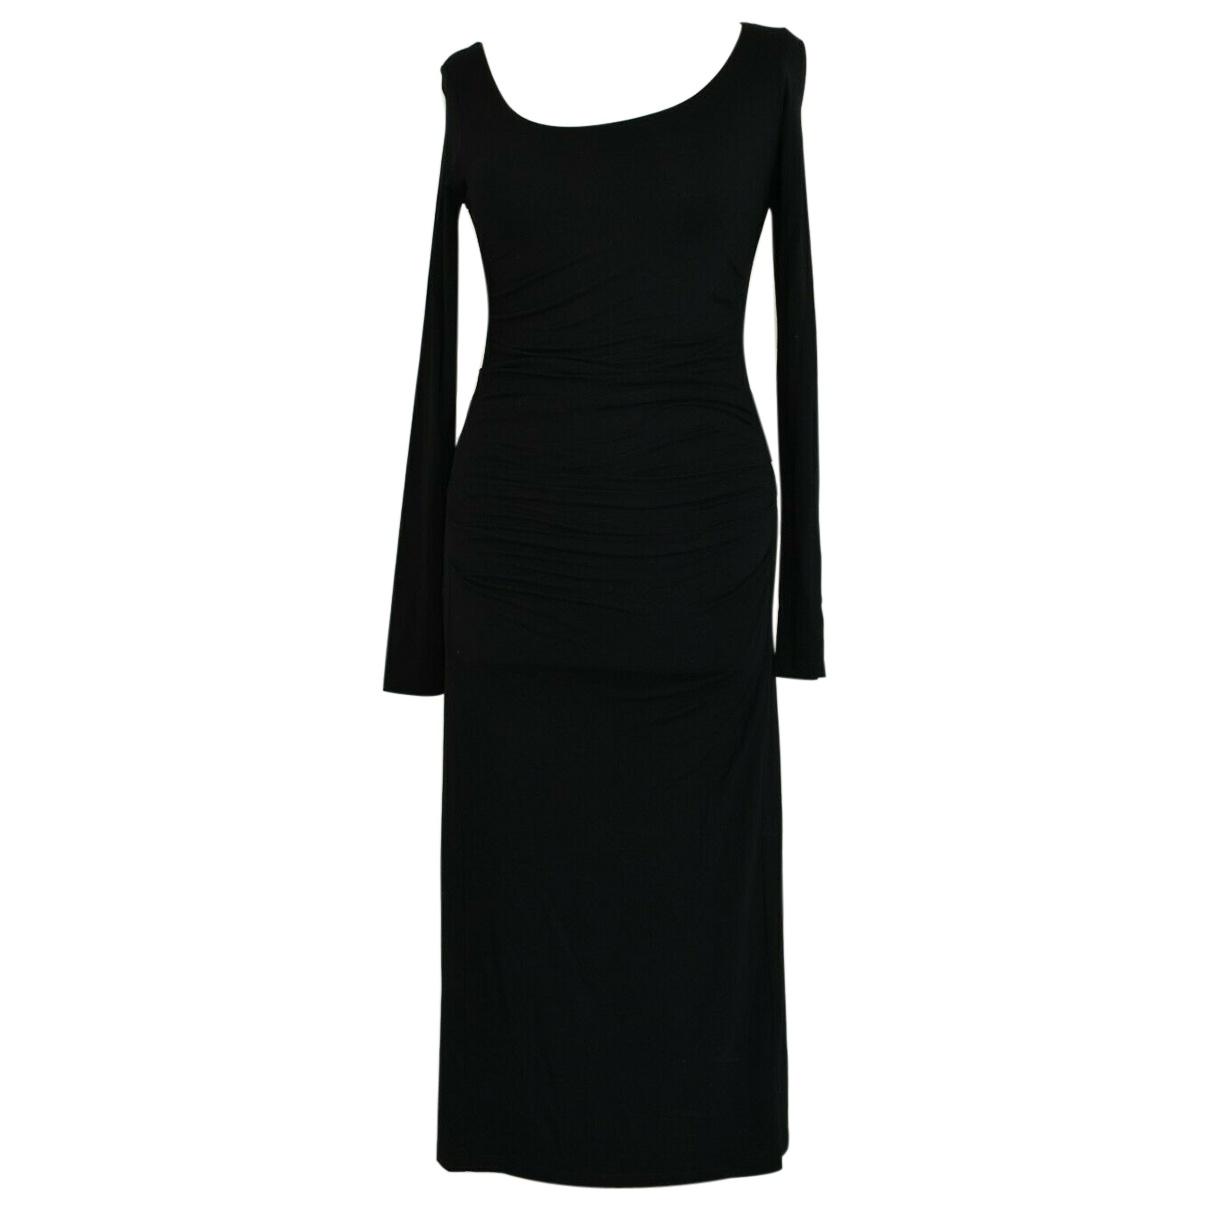 Paul Smith \N Black Cotton dress for Women 8 UK